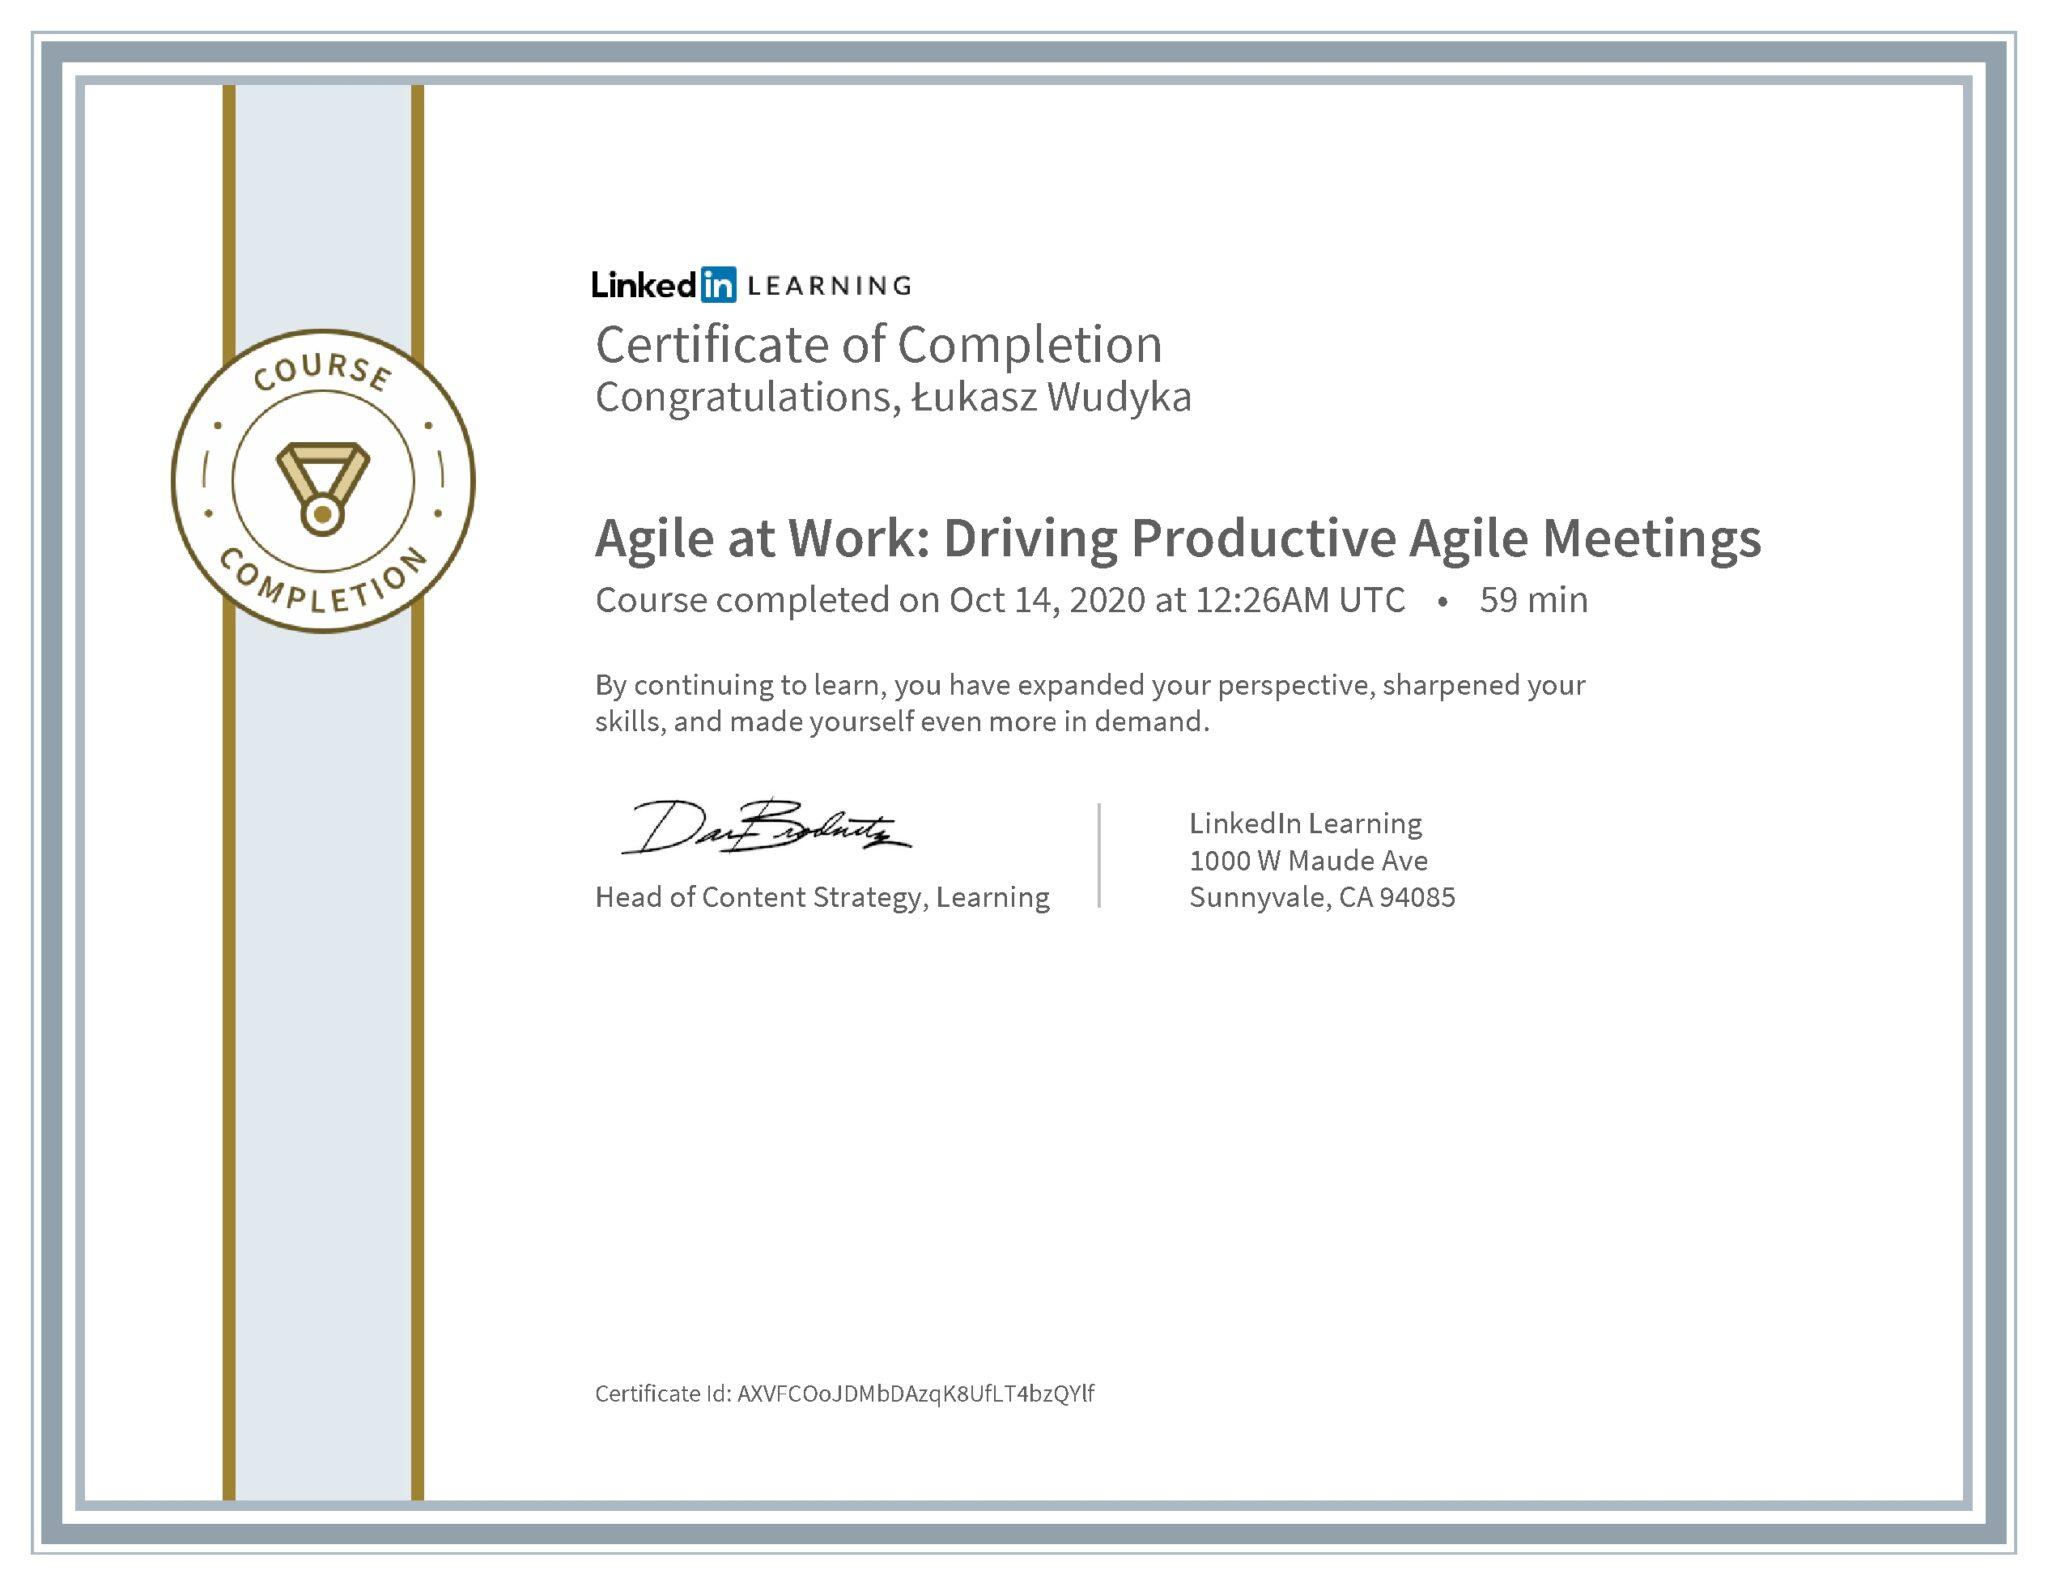 Łukasz Wudyka certyfikat LinkedIn Agile at Work: Driving Productive Agile Meetings